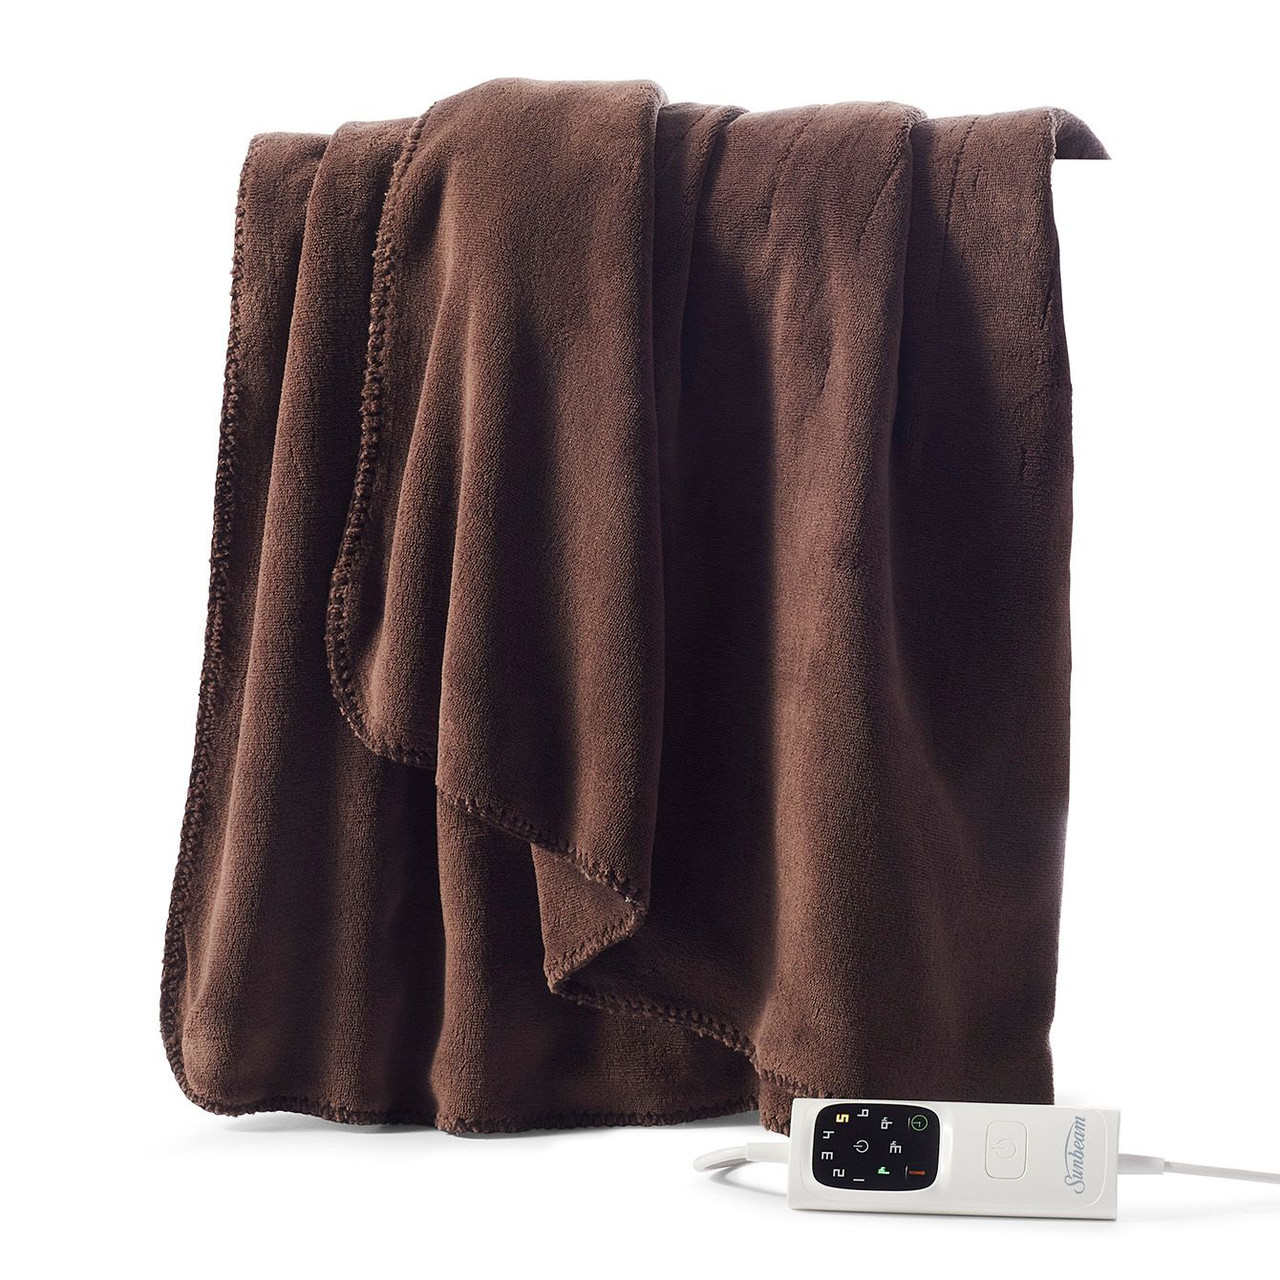 Sunbeam TRF4100 Sunbeam Feel Perfect Sherpa Fleece Heated Throw Blanket